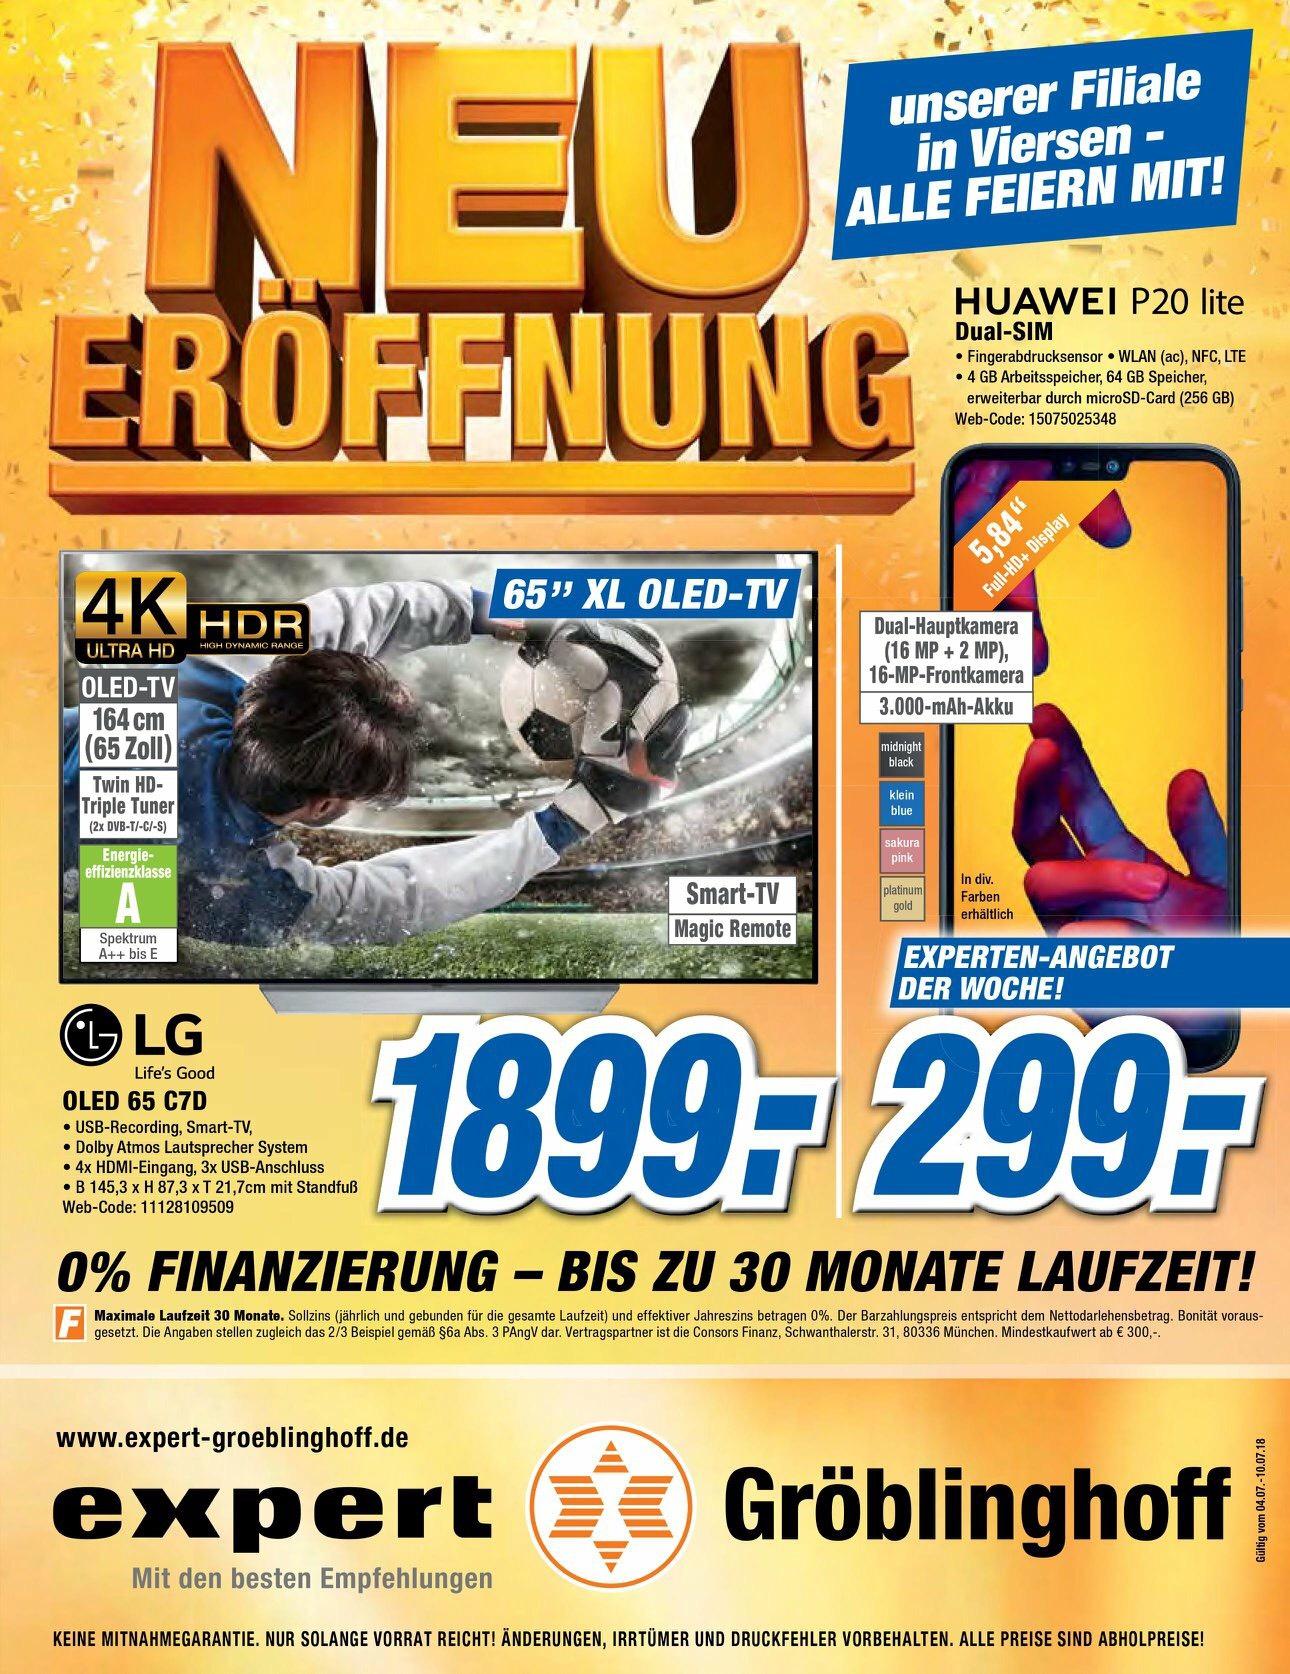 LG OLED65C7D bei Expert Groeblinghoff, Versand möglich